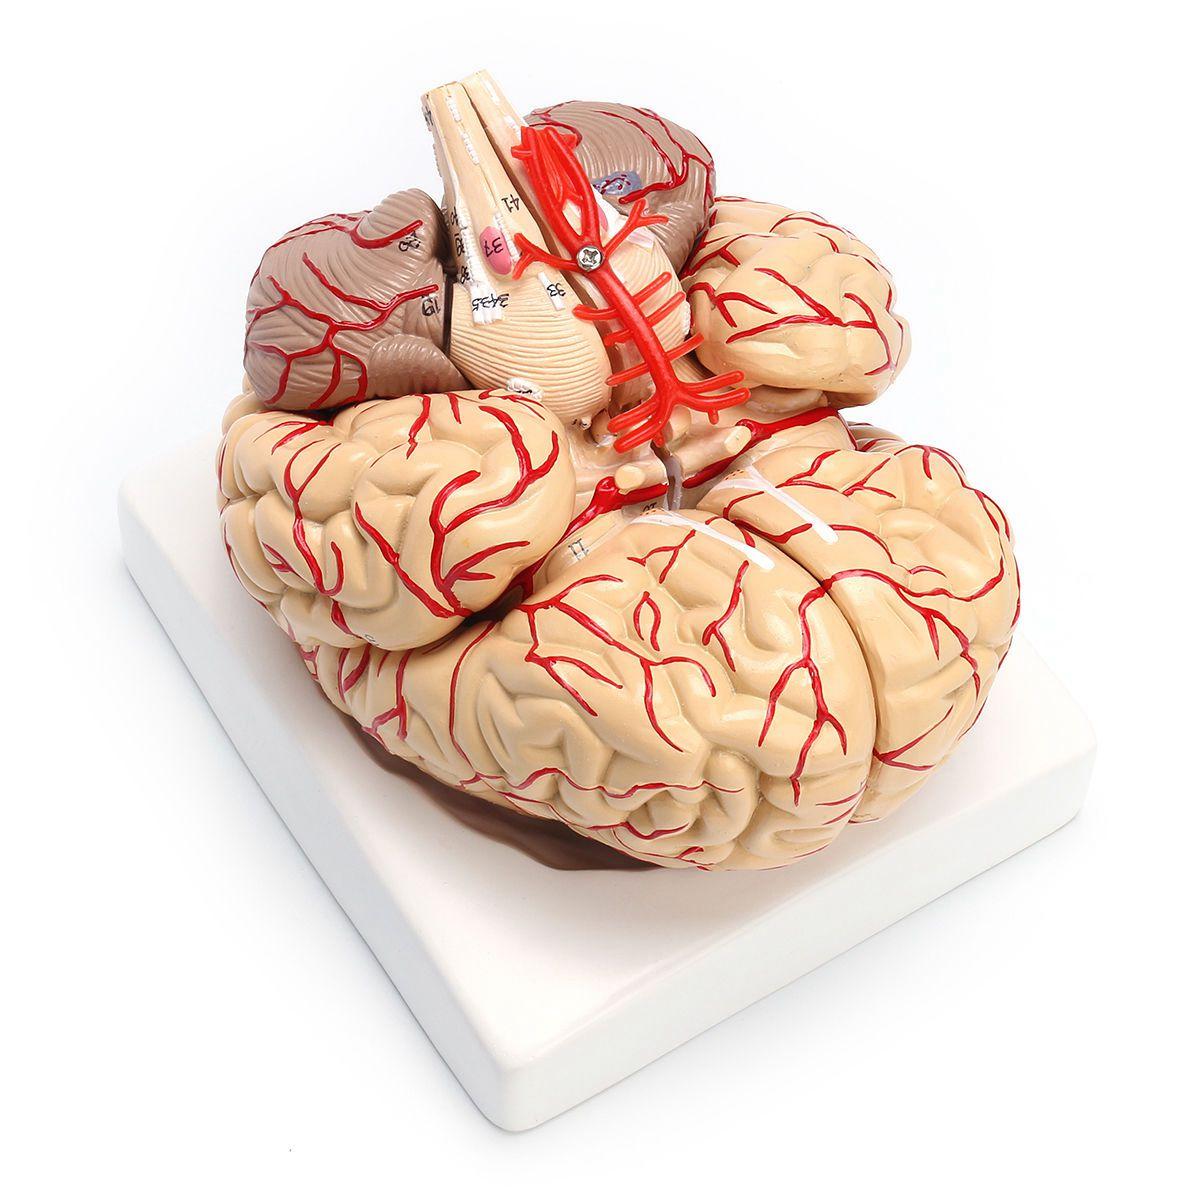 1: 1 Life Size Human Anatomical Brain Pro Dissection Medical Organ Teaching Model